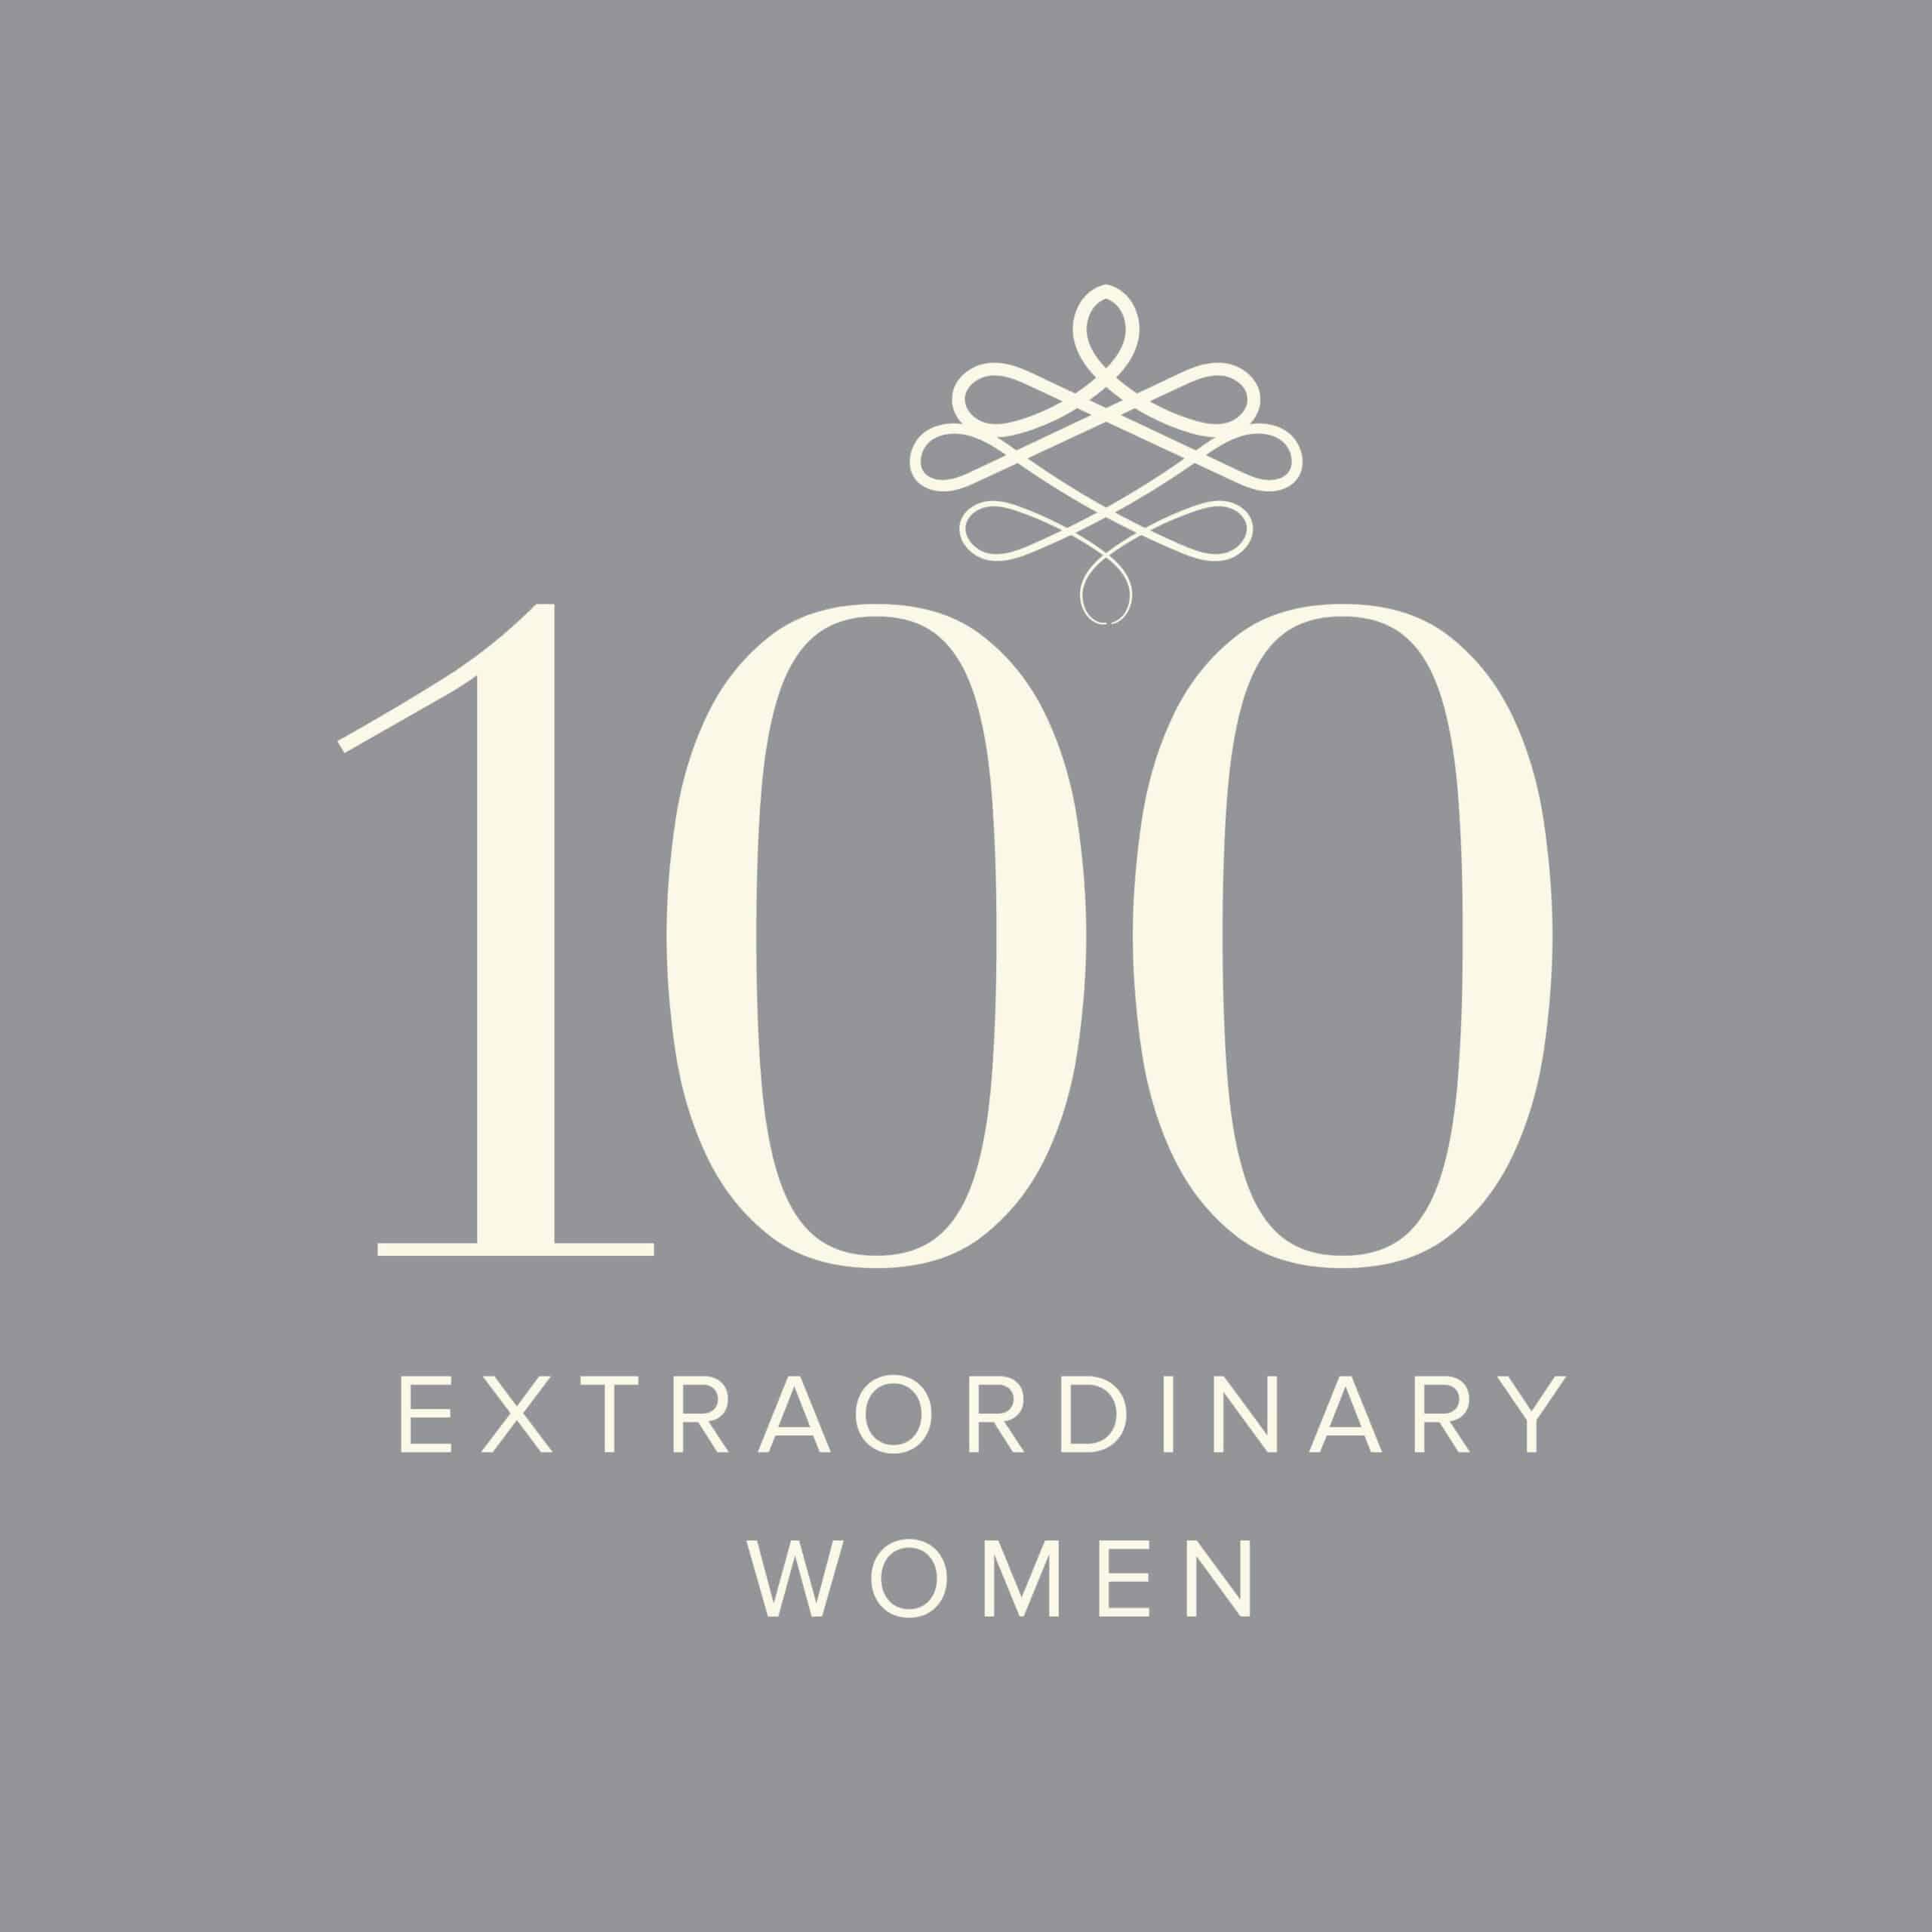 100 Extraordinary Women